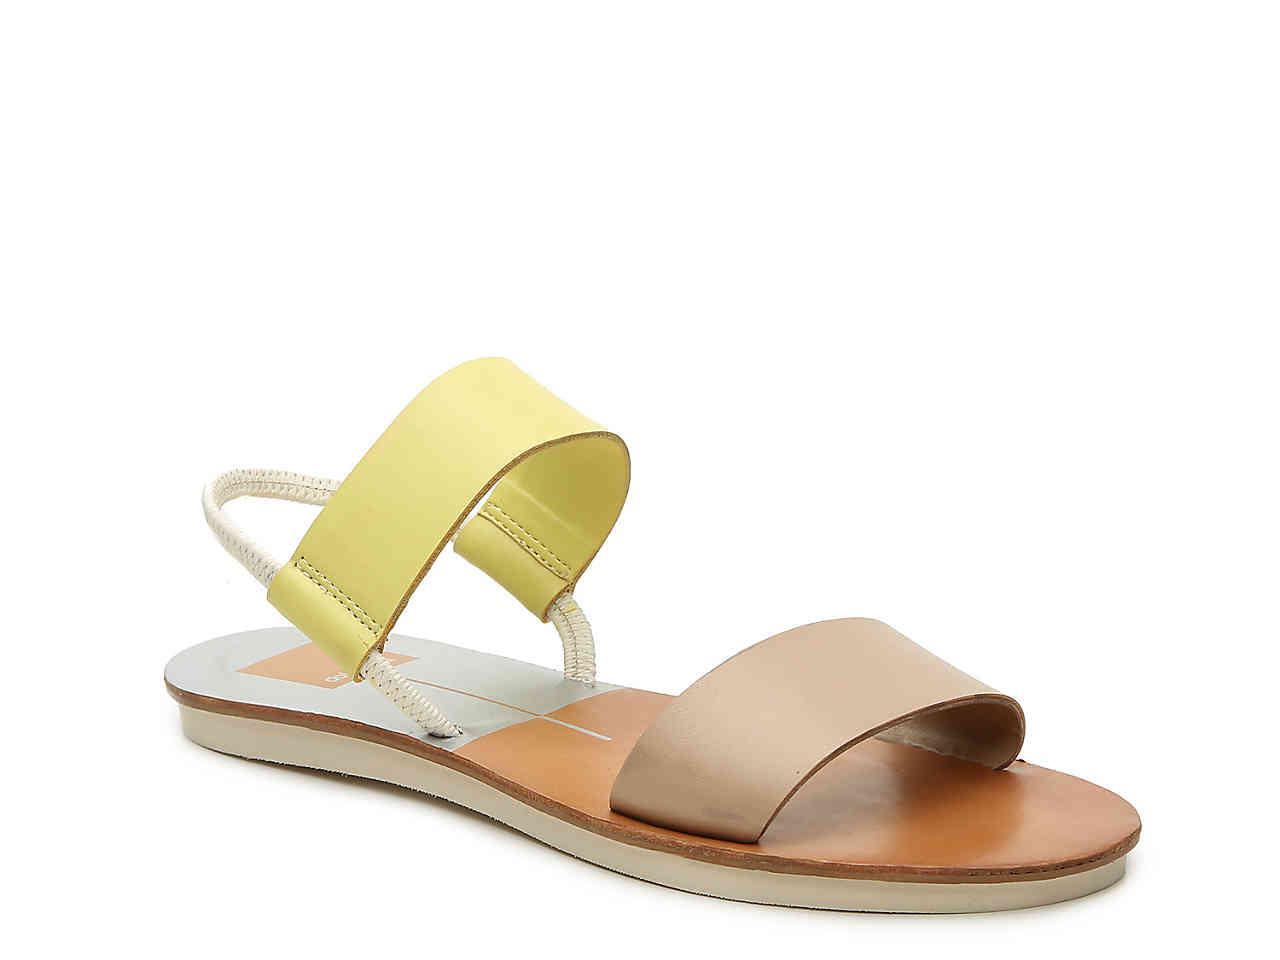 Dolce Vita. Women's Neily Flat Sandal